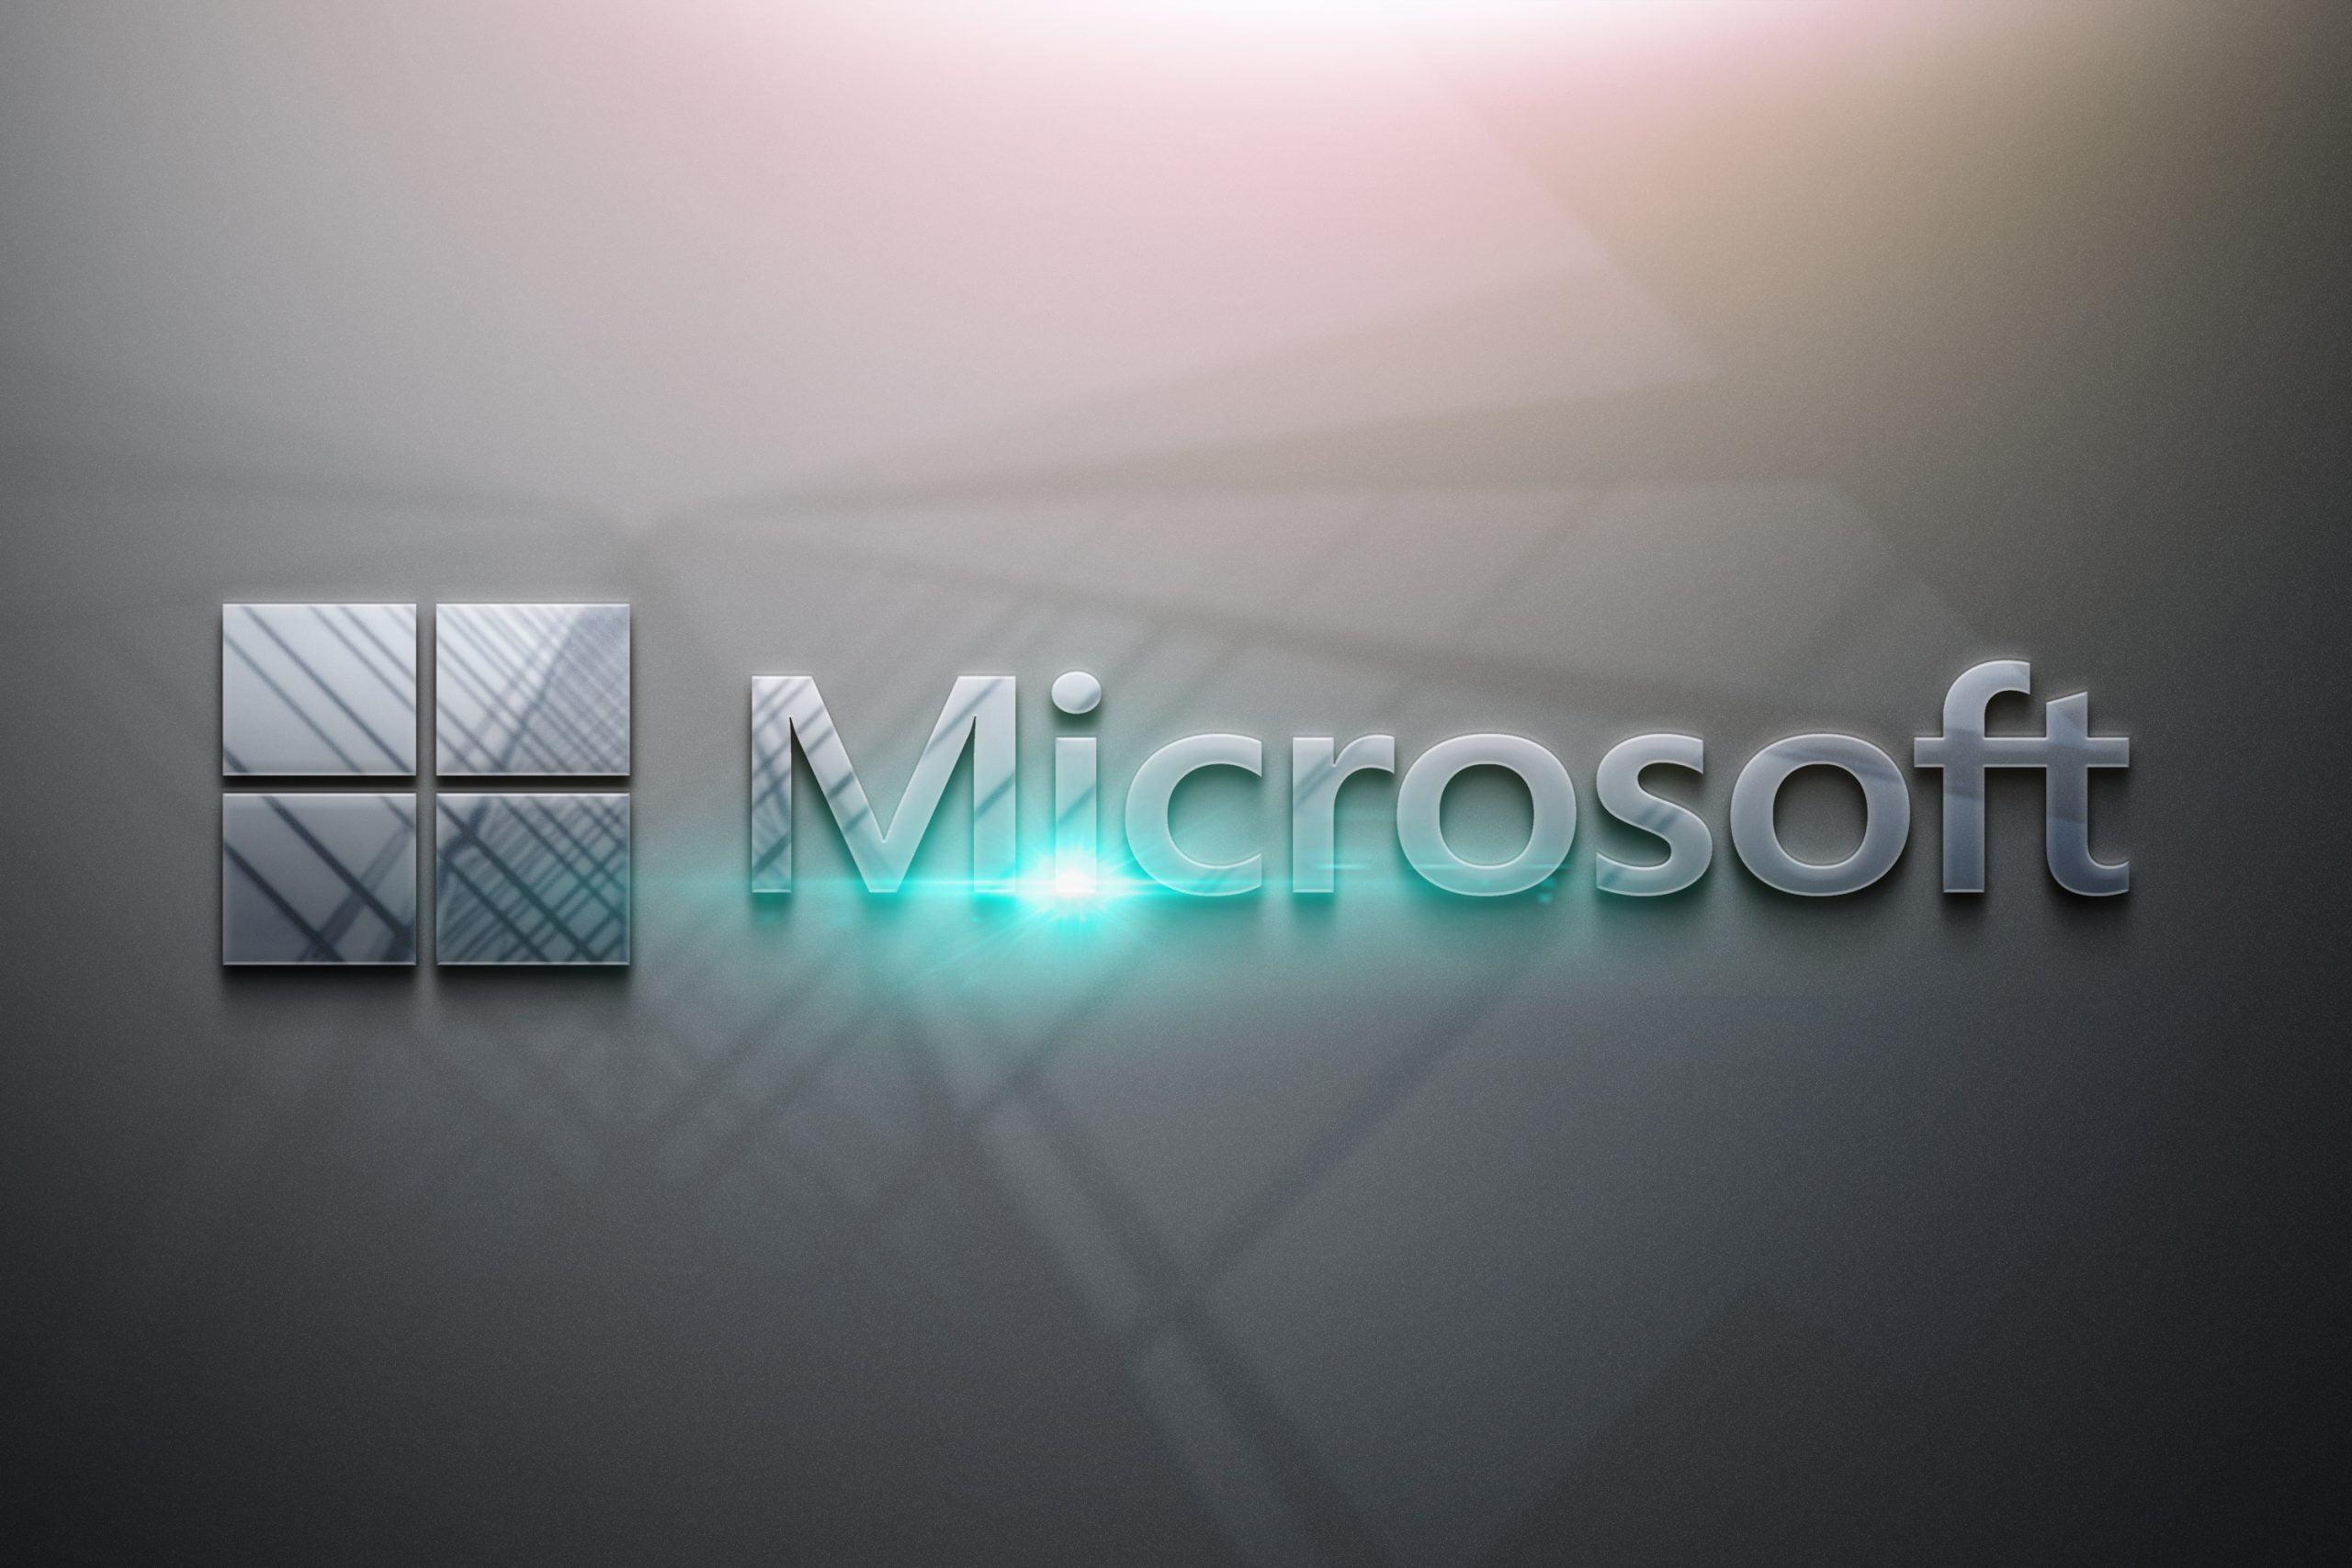 Microsoft-Free-Photoshop-Glossy-3D-Logo-Mockup